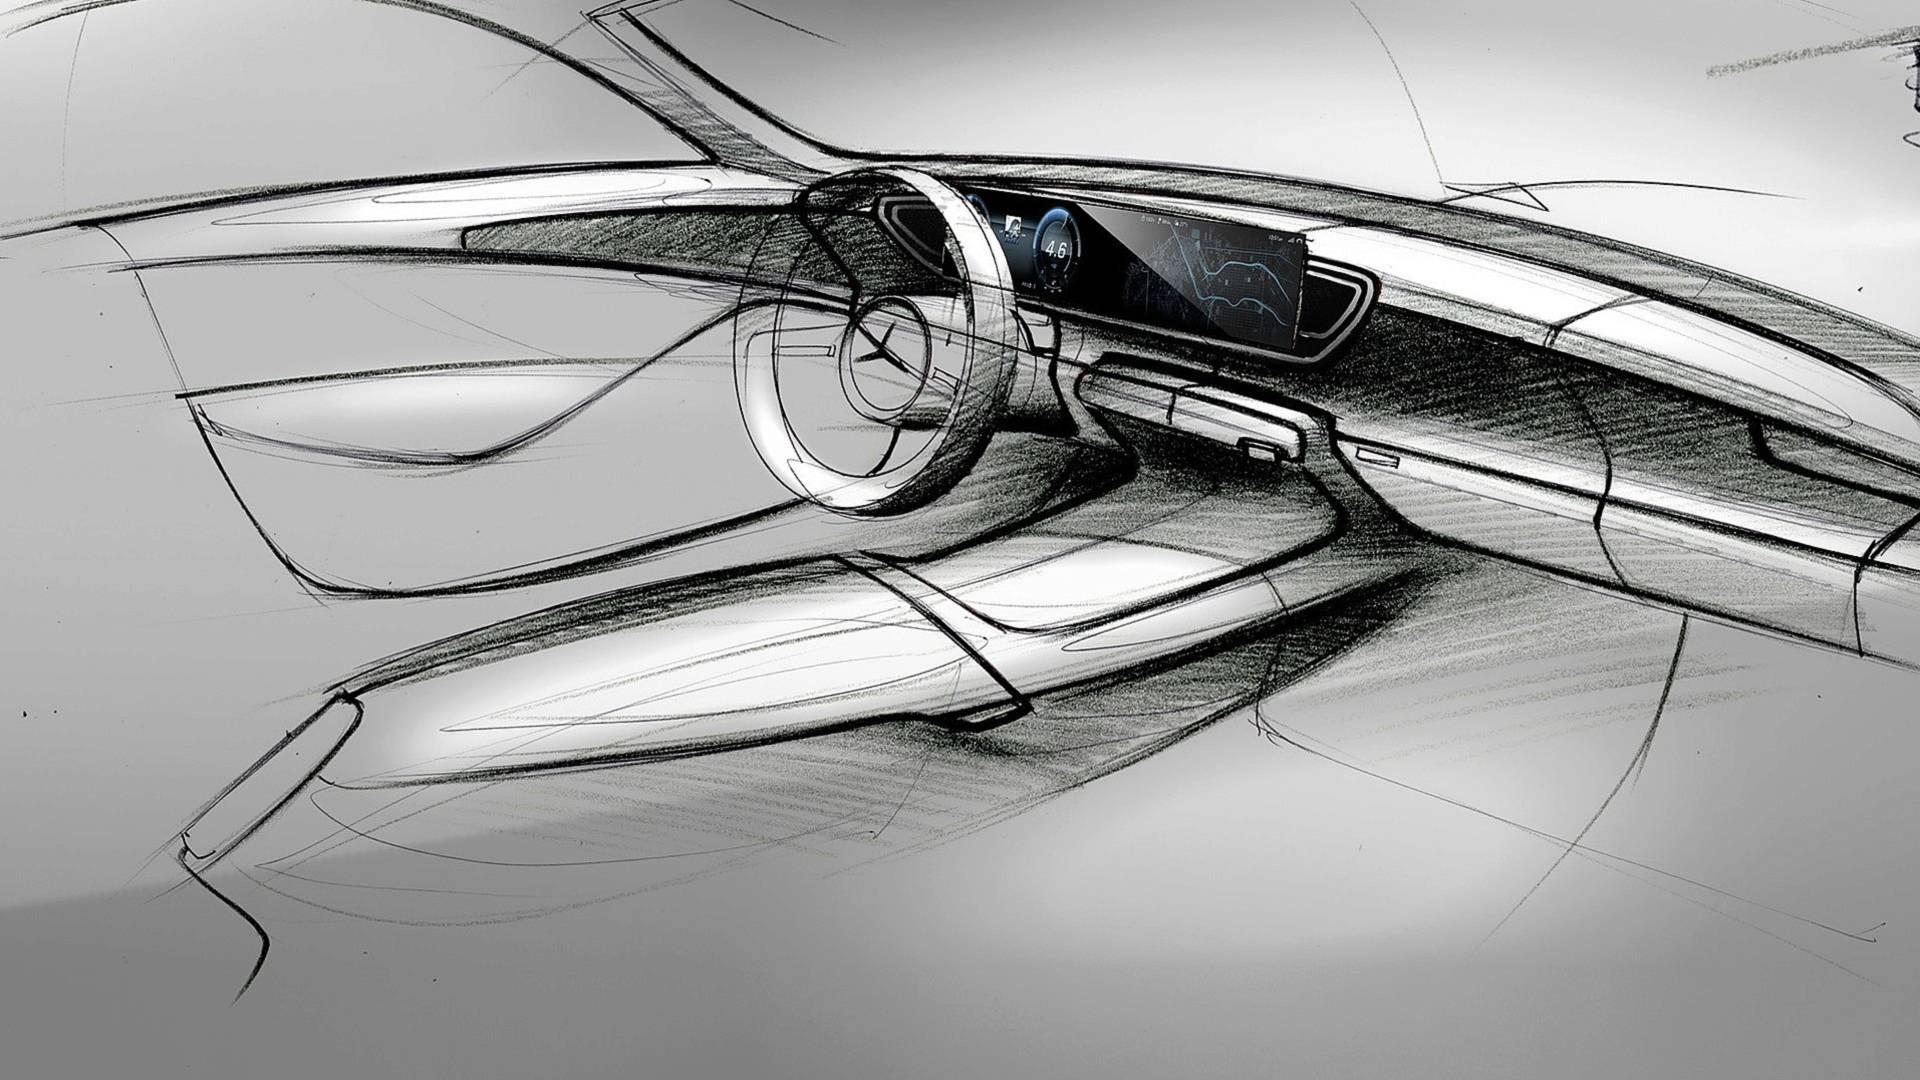 Mercedes GLE MY 2019 - Teaser